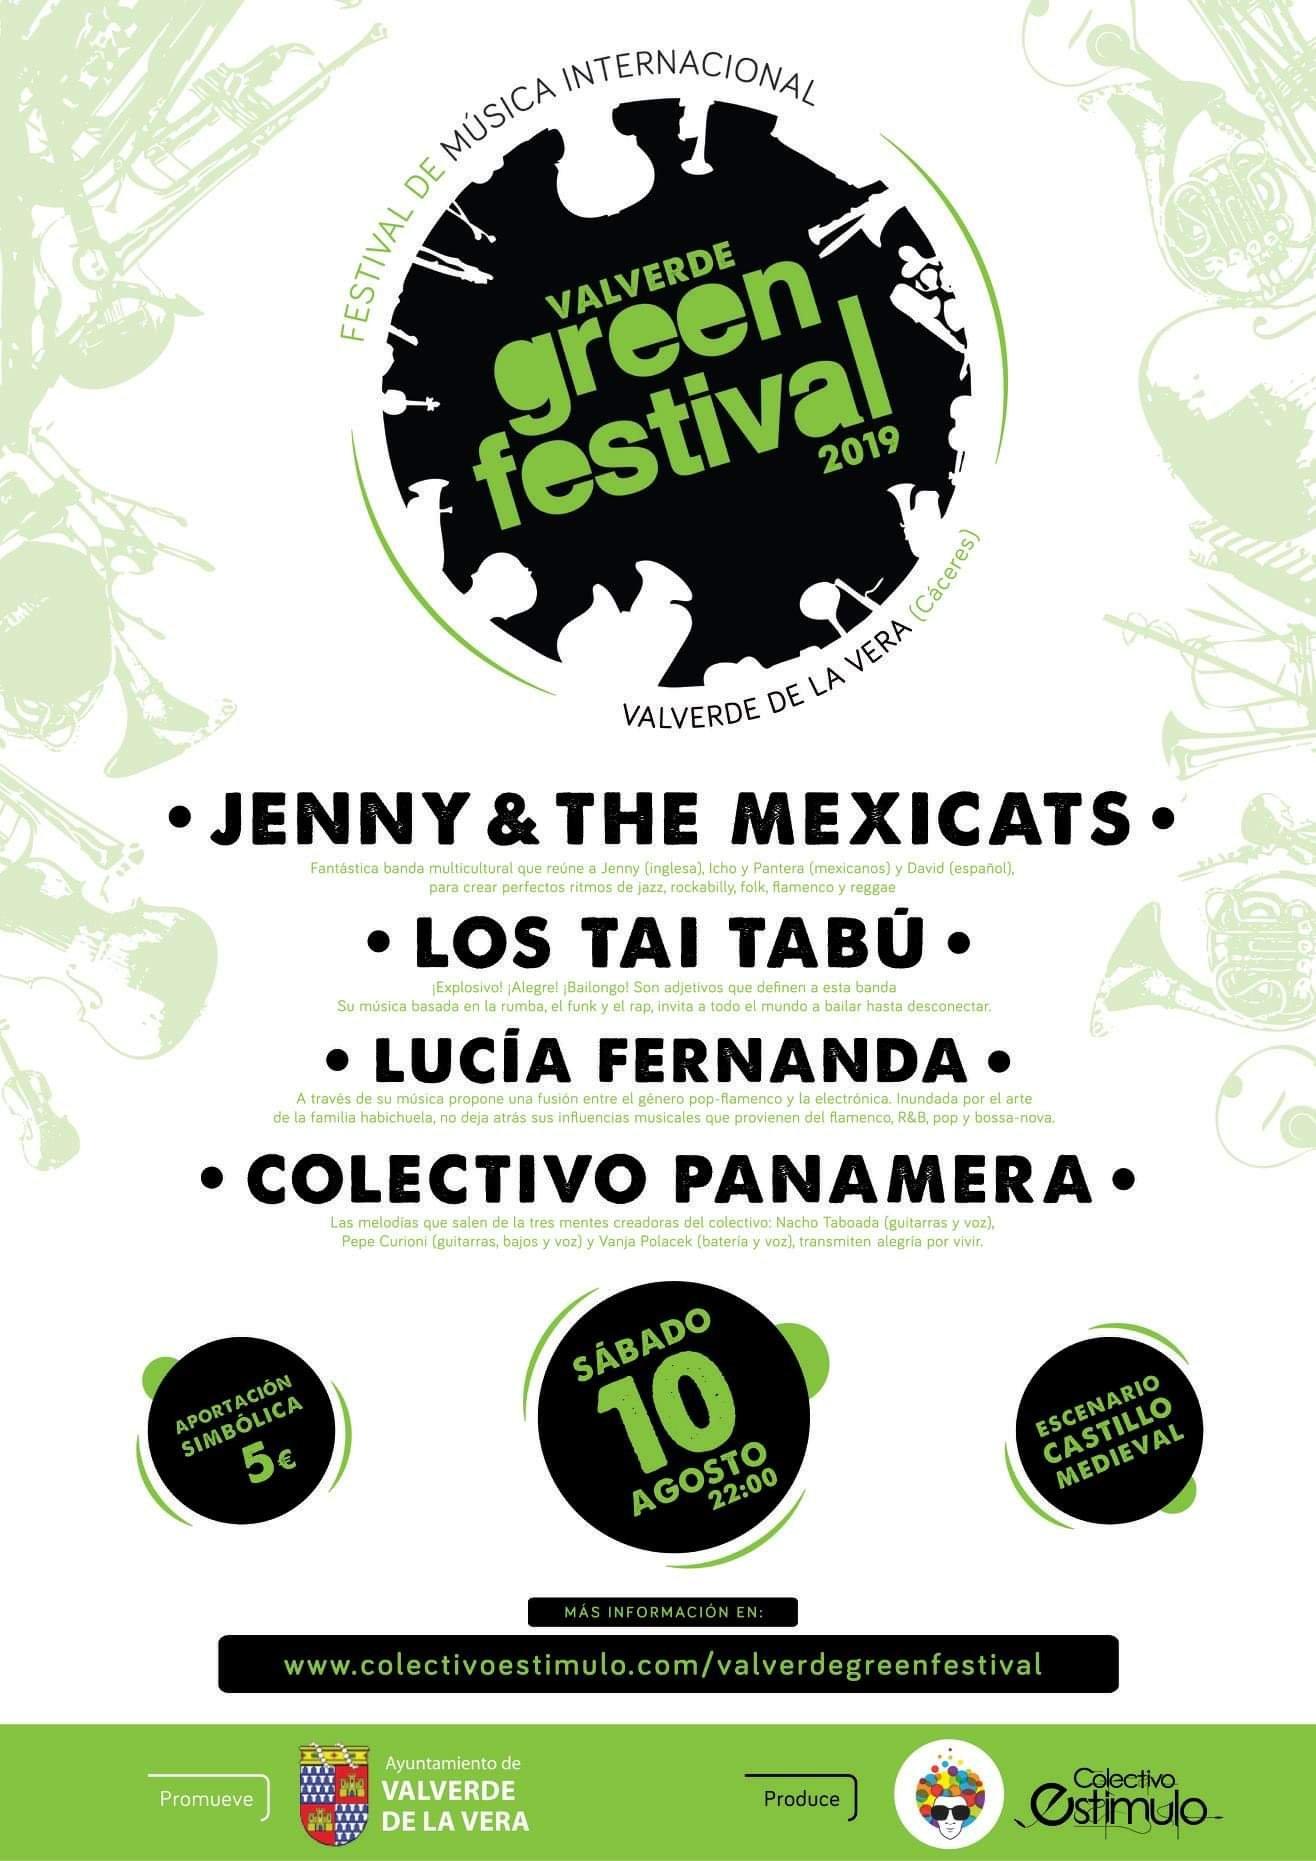 Green festival 2019 - Valverde de la Vera (Cáceres)